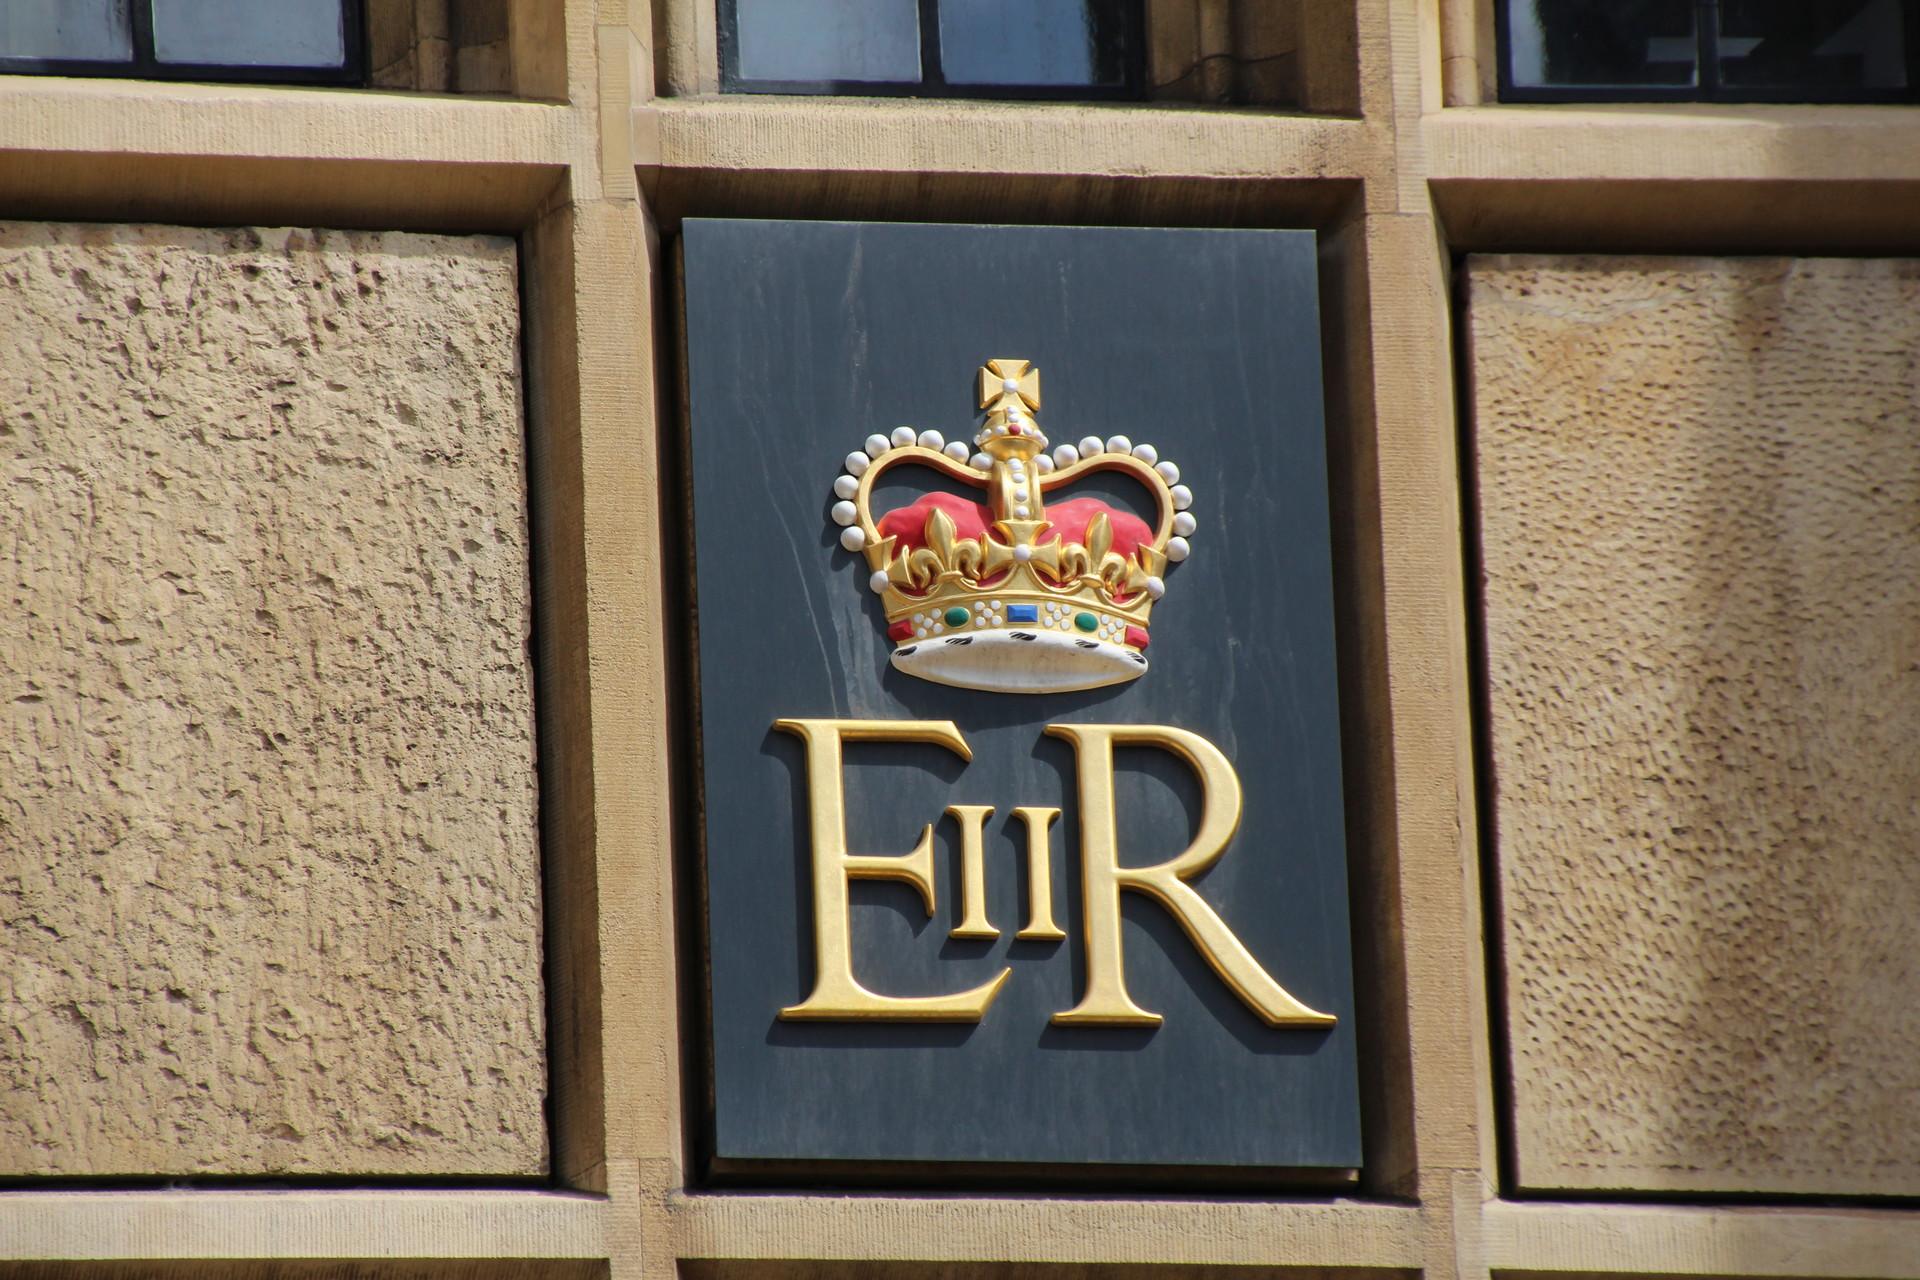 tower-of-london-la-torre-londres-1238876